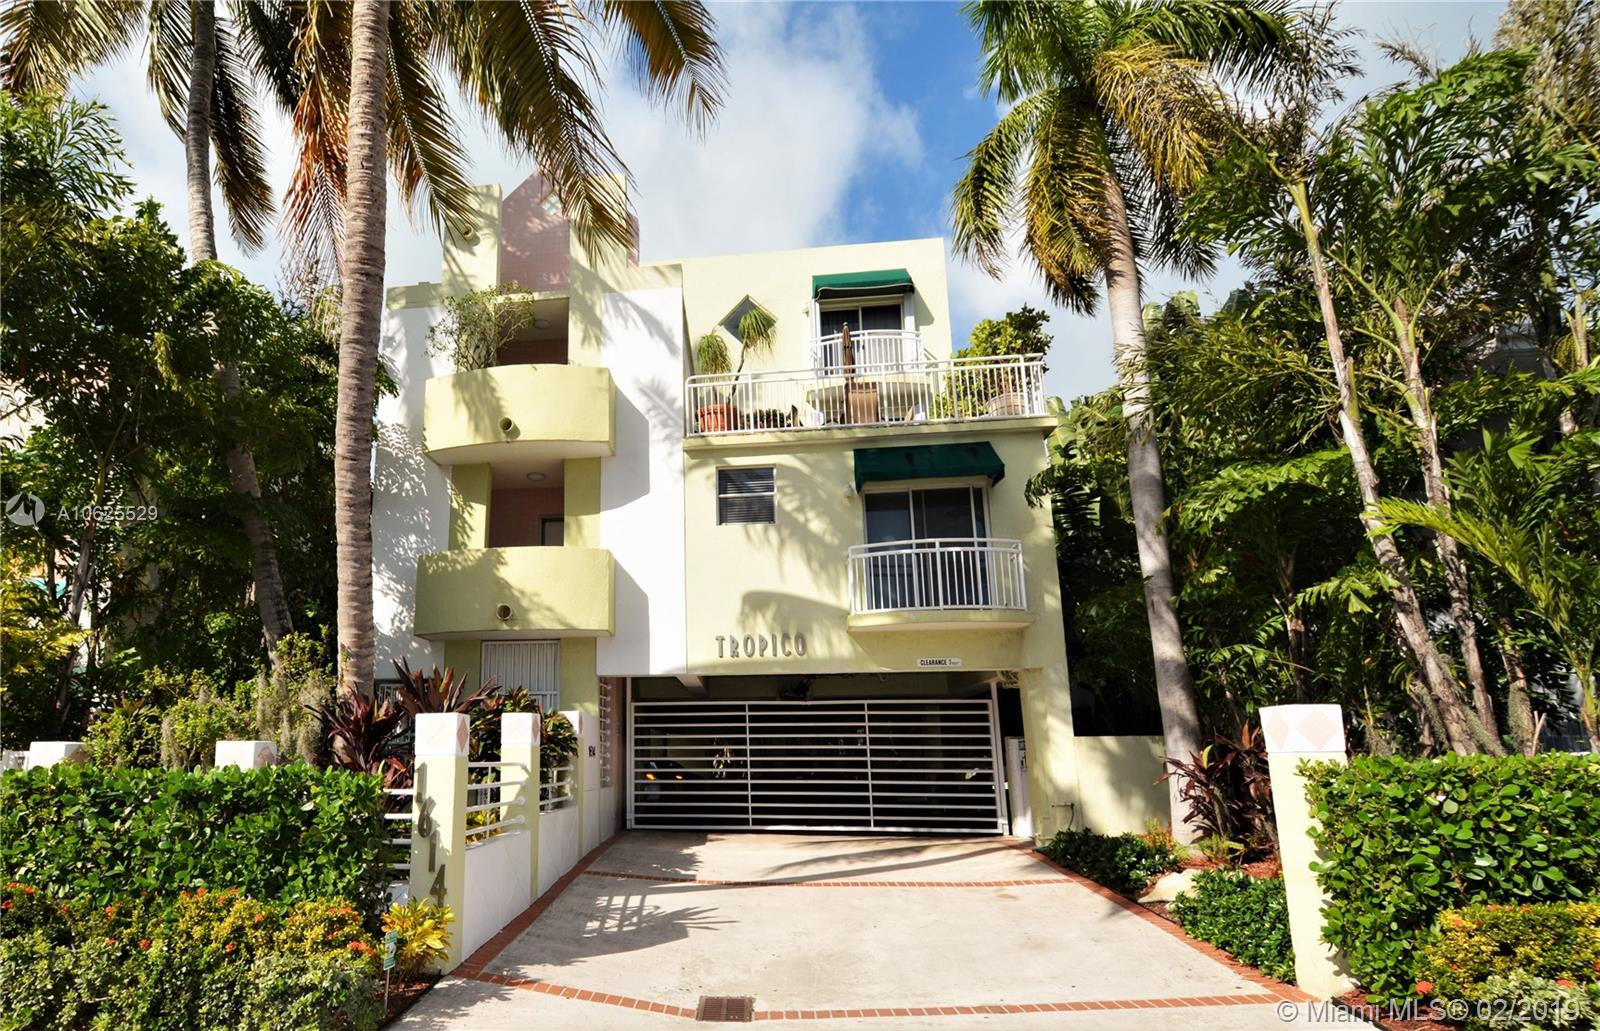 Photo -  , 1614 Euclid Ave # 33, Miami Beach FL 33139